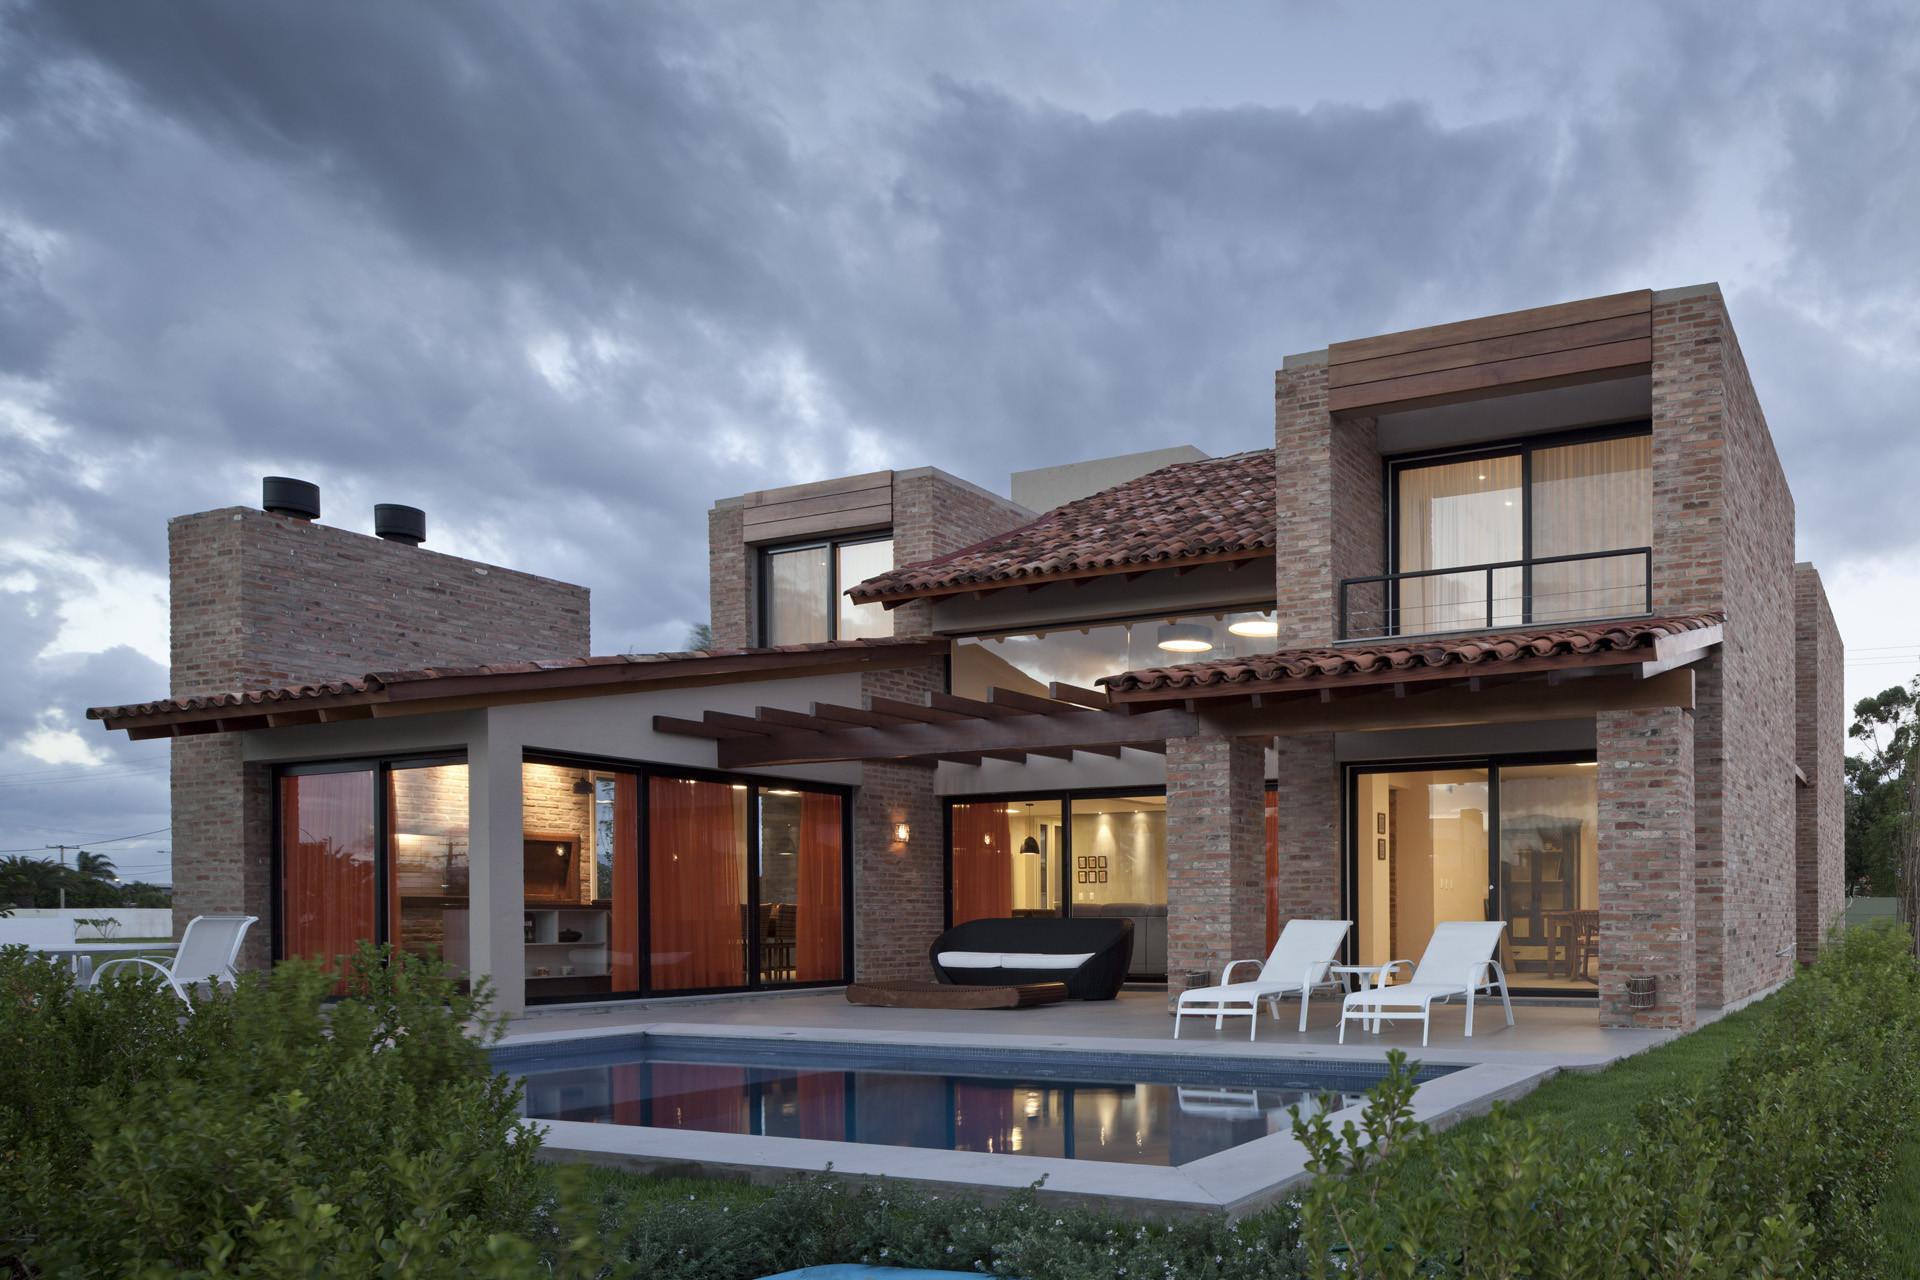 Galer a de casa ckn giugliani montero arquitectos 5 for Galerias casas minimalistas